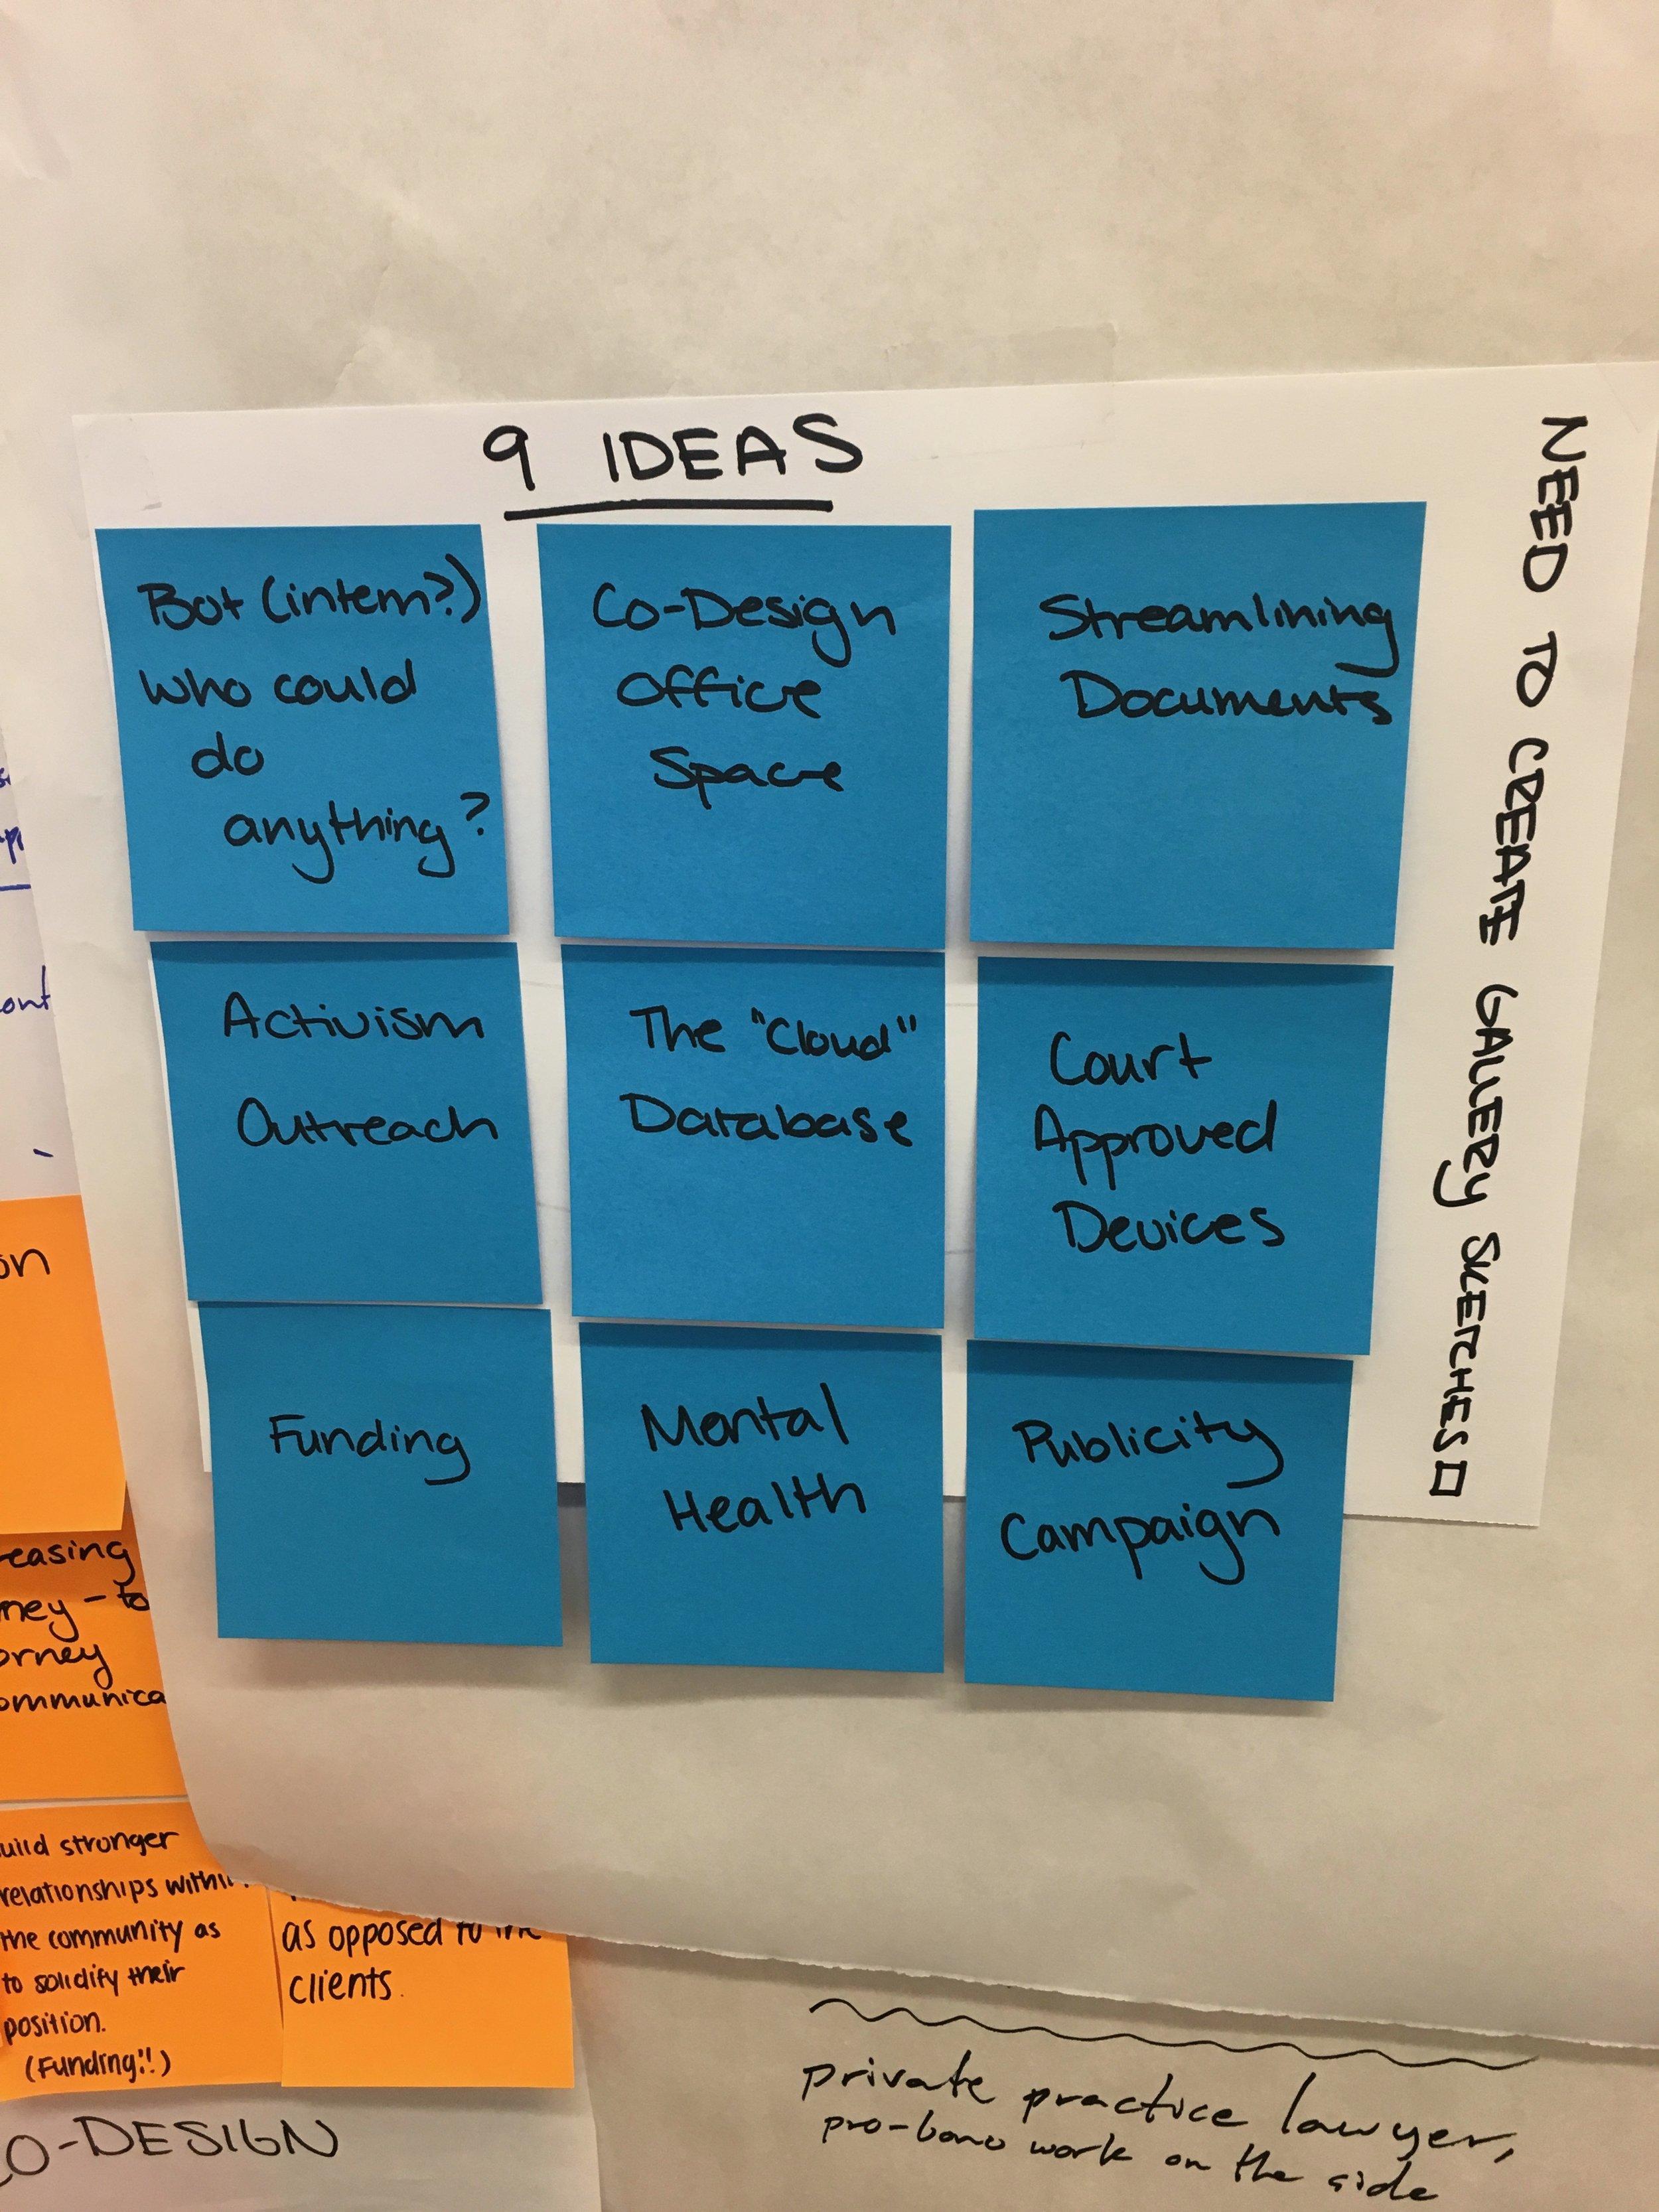 Final 9 ideas